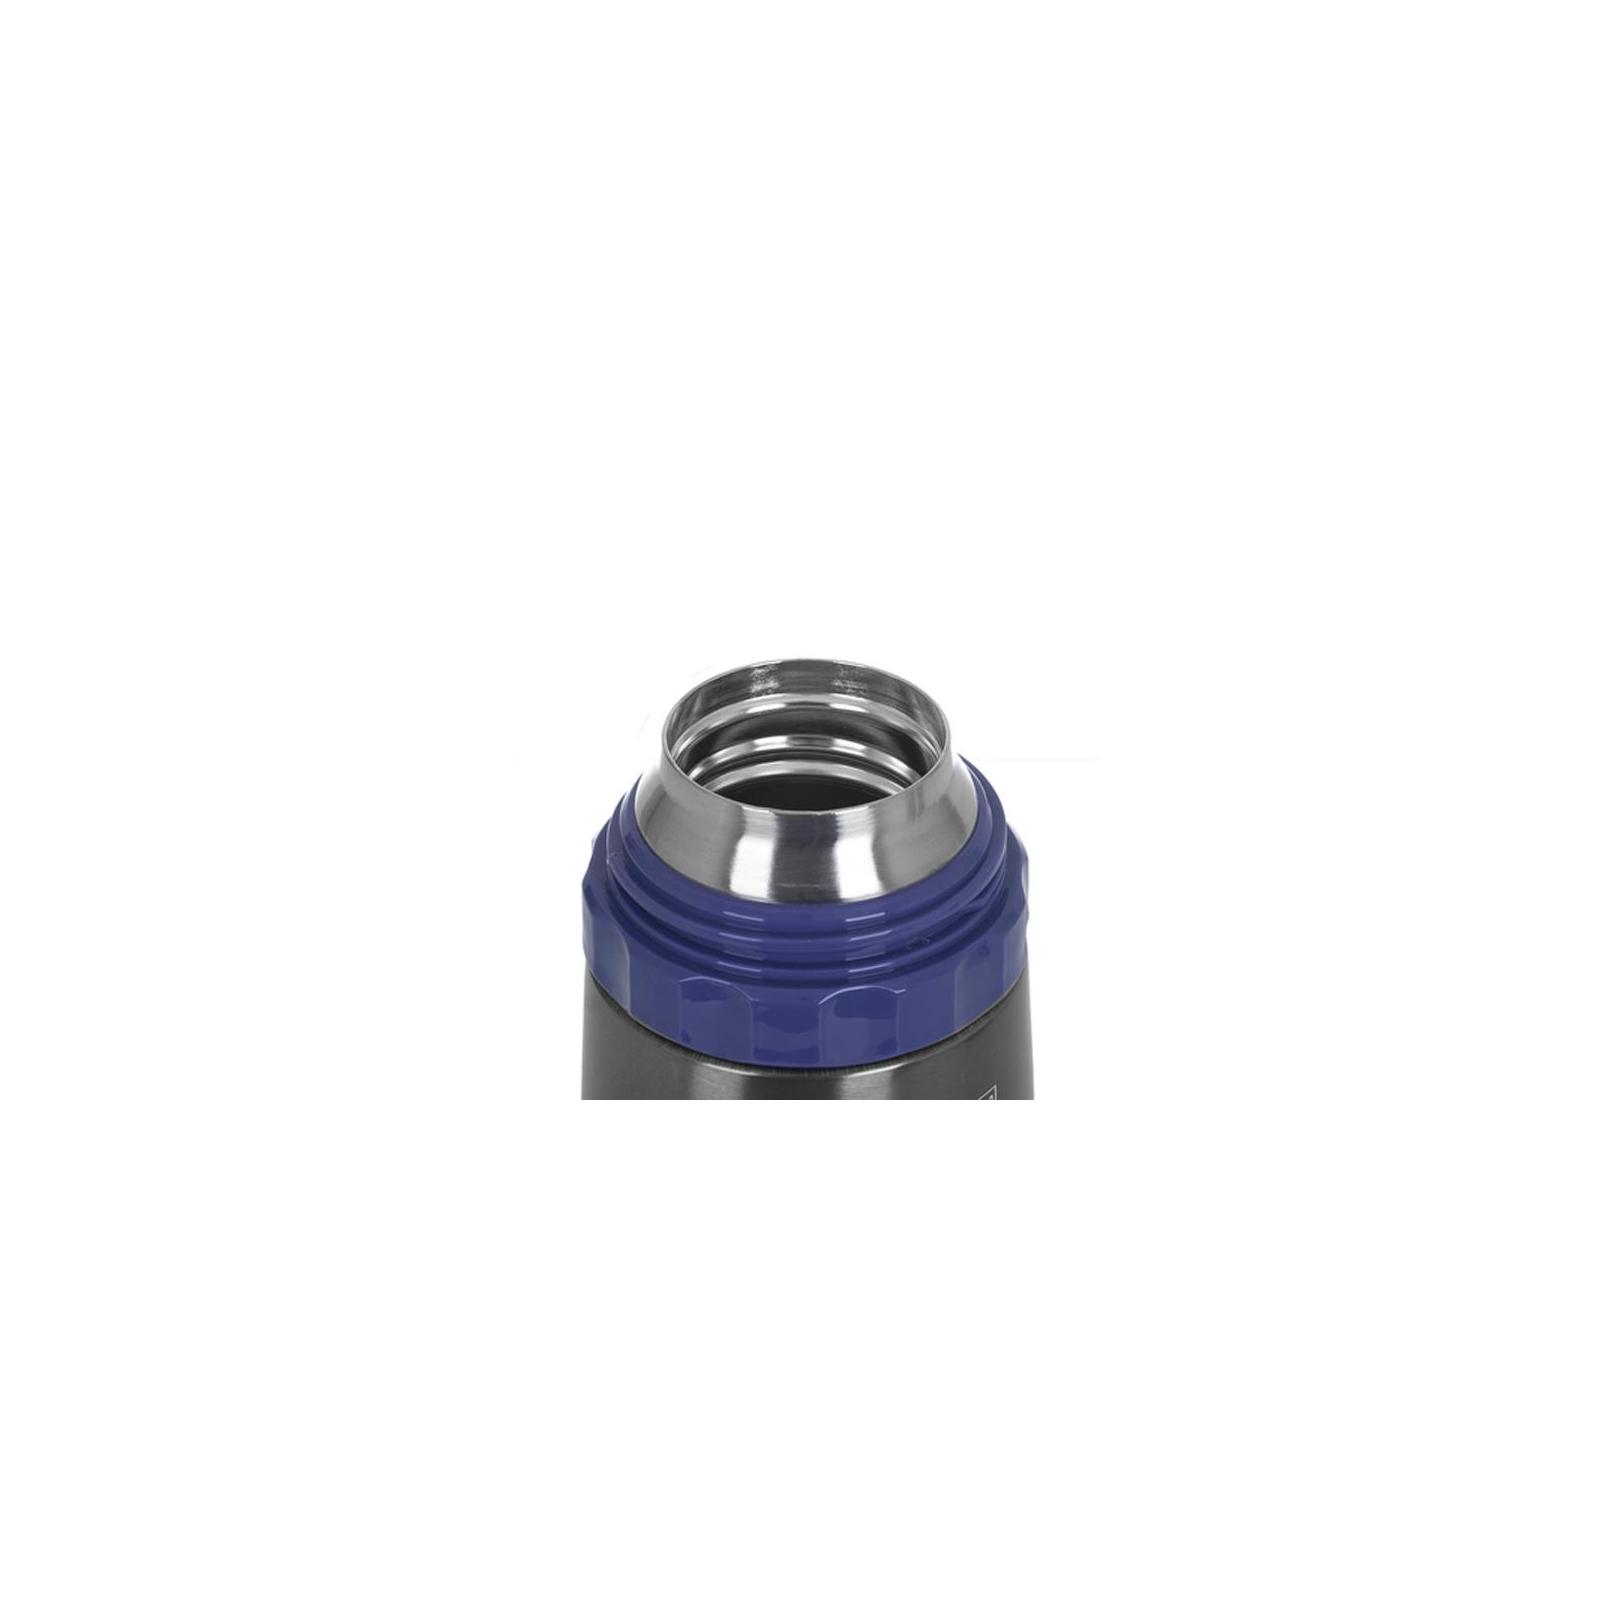 Термос Ringel Solo 0.4 L Black (RG-6101-400/2) изображение 4